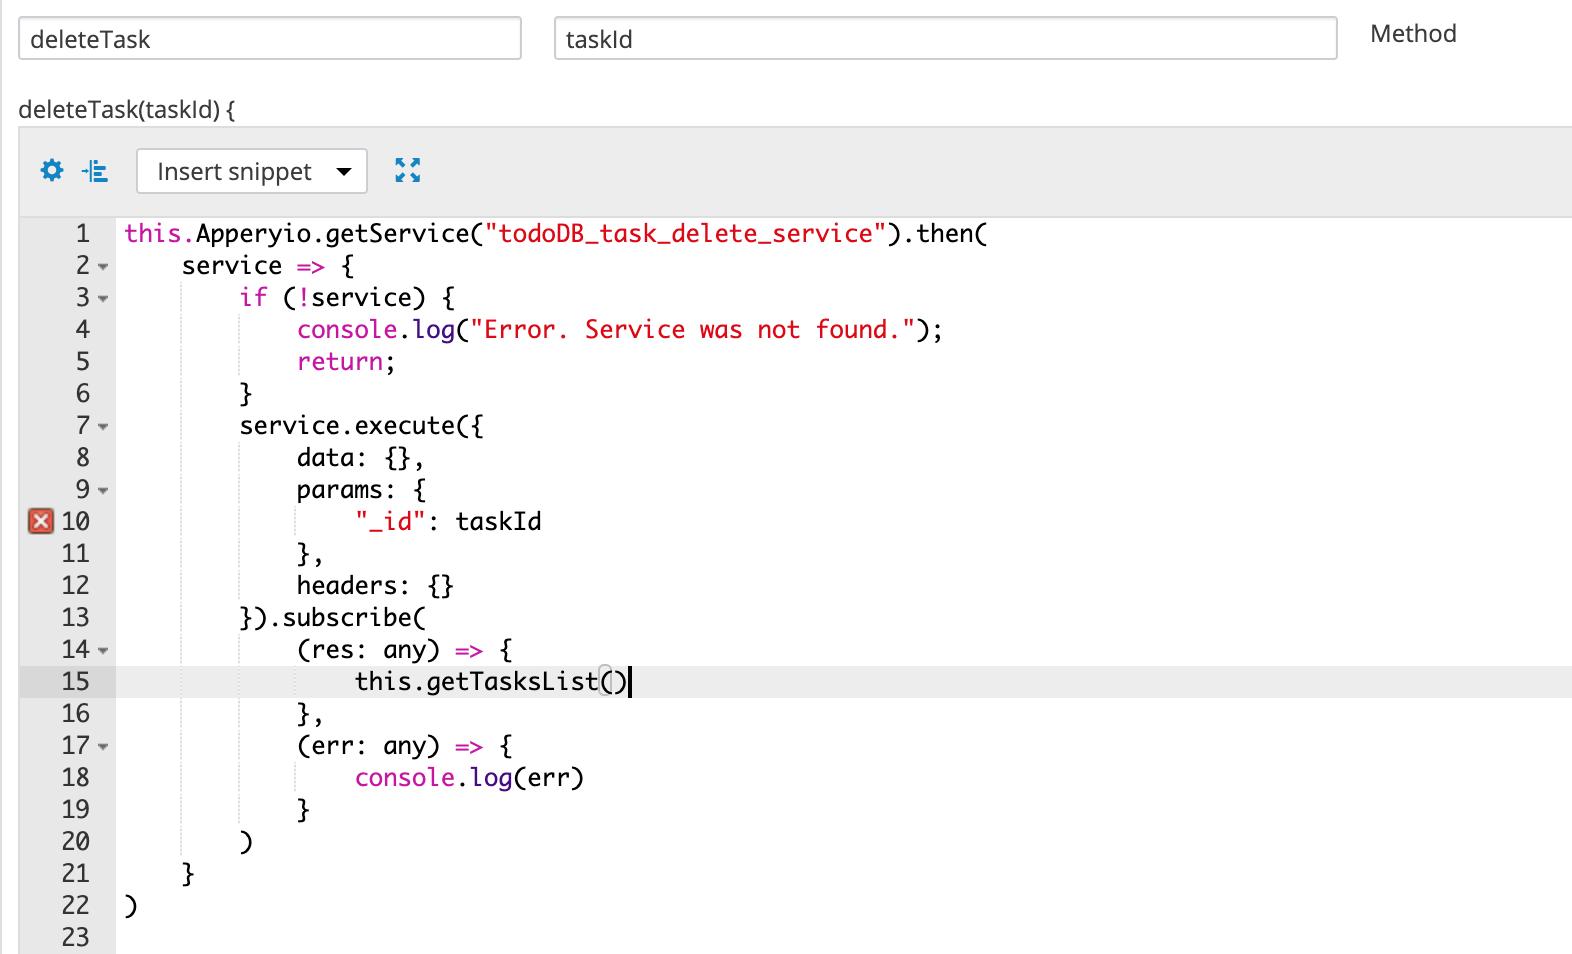 deleteTask code